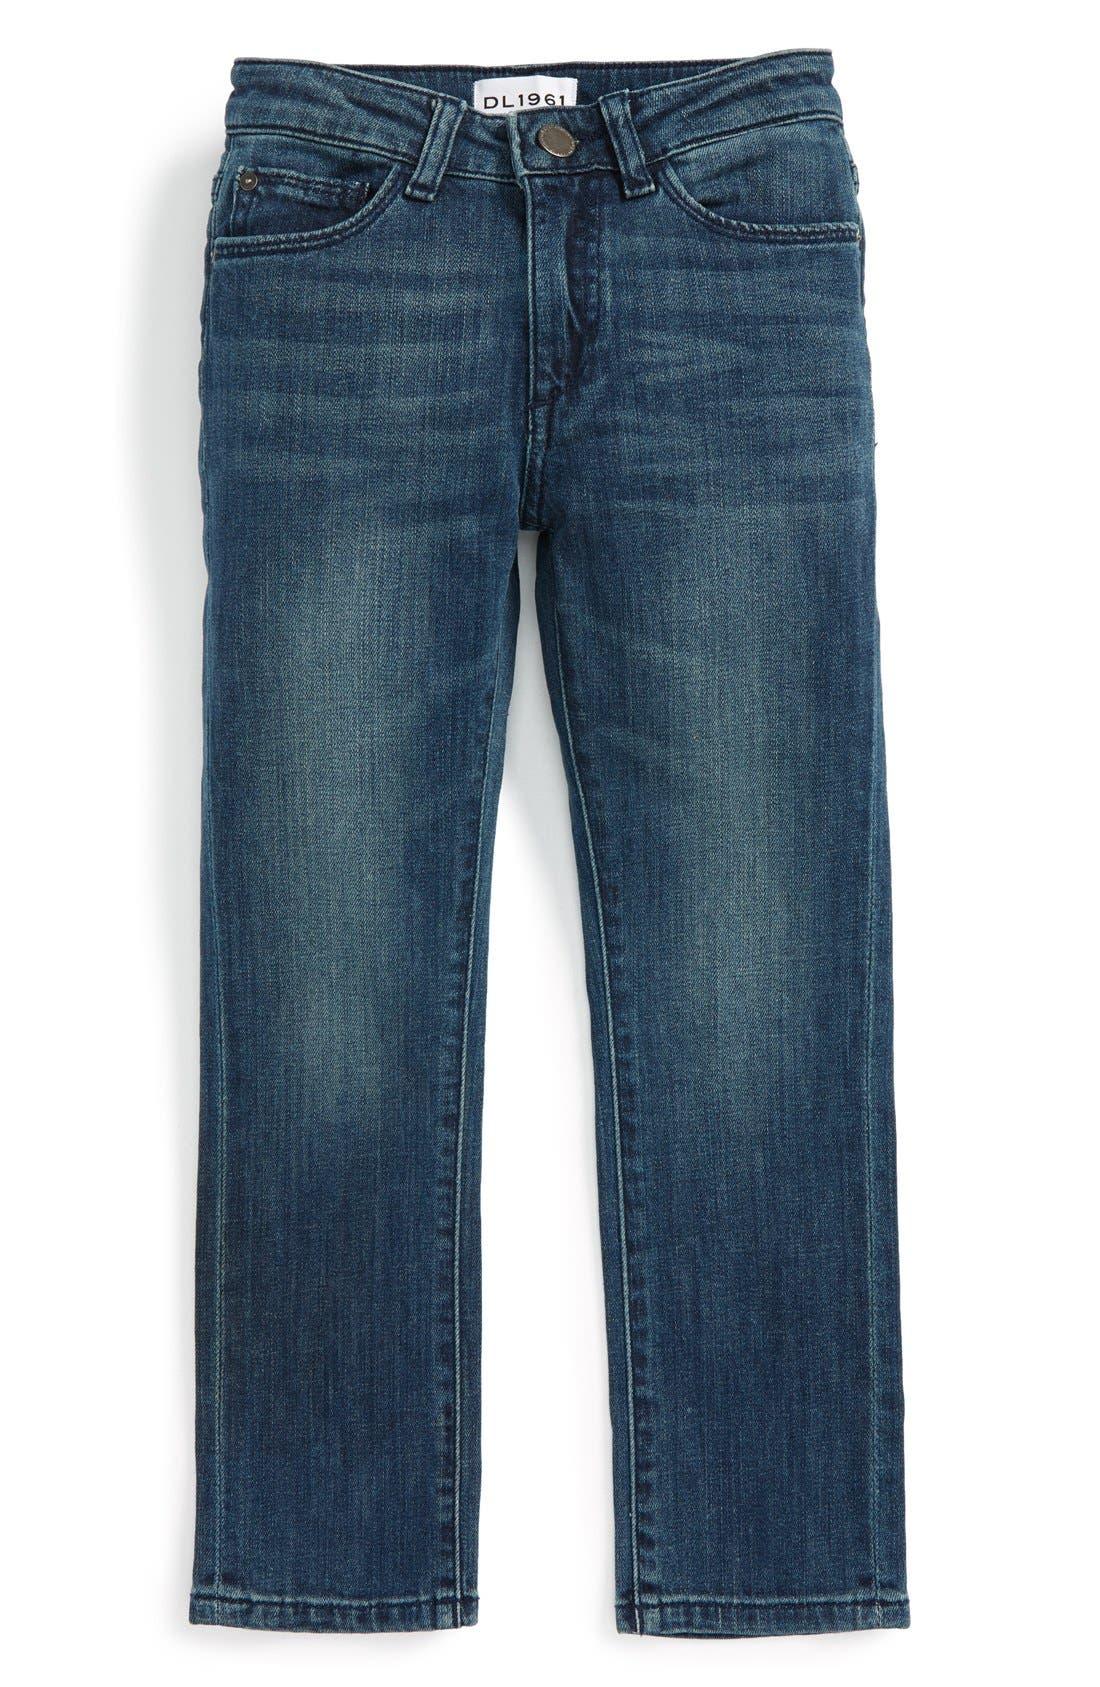 DL1961 'Hawke' Skinny Jeans (Toddler Boys & Little Boys)